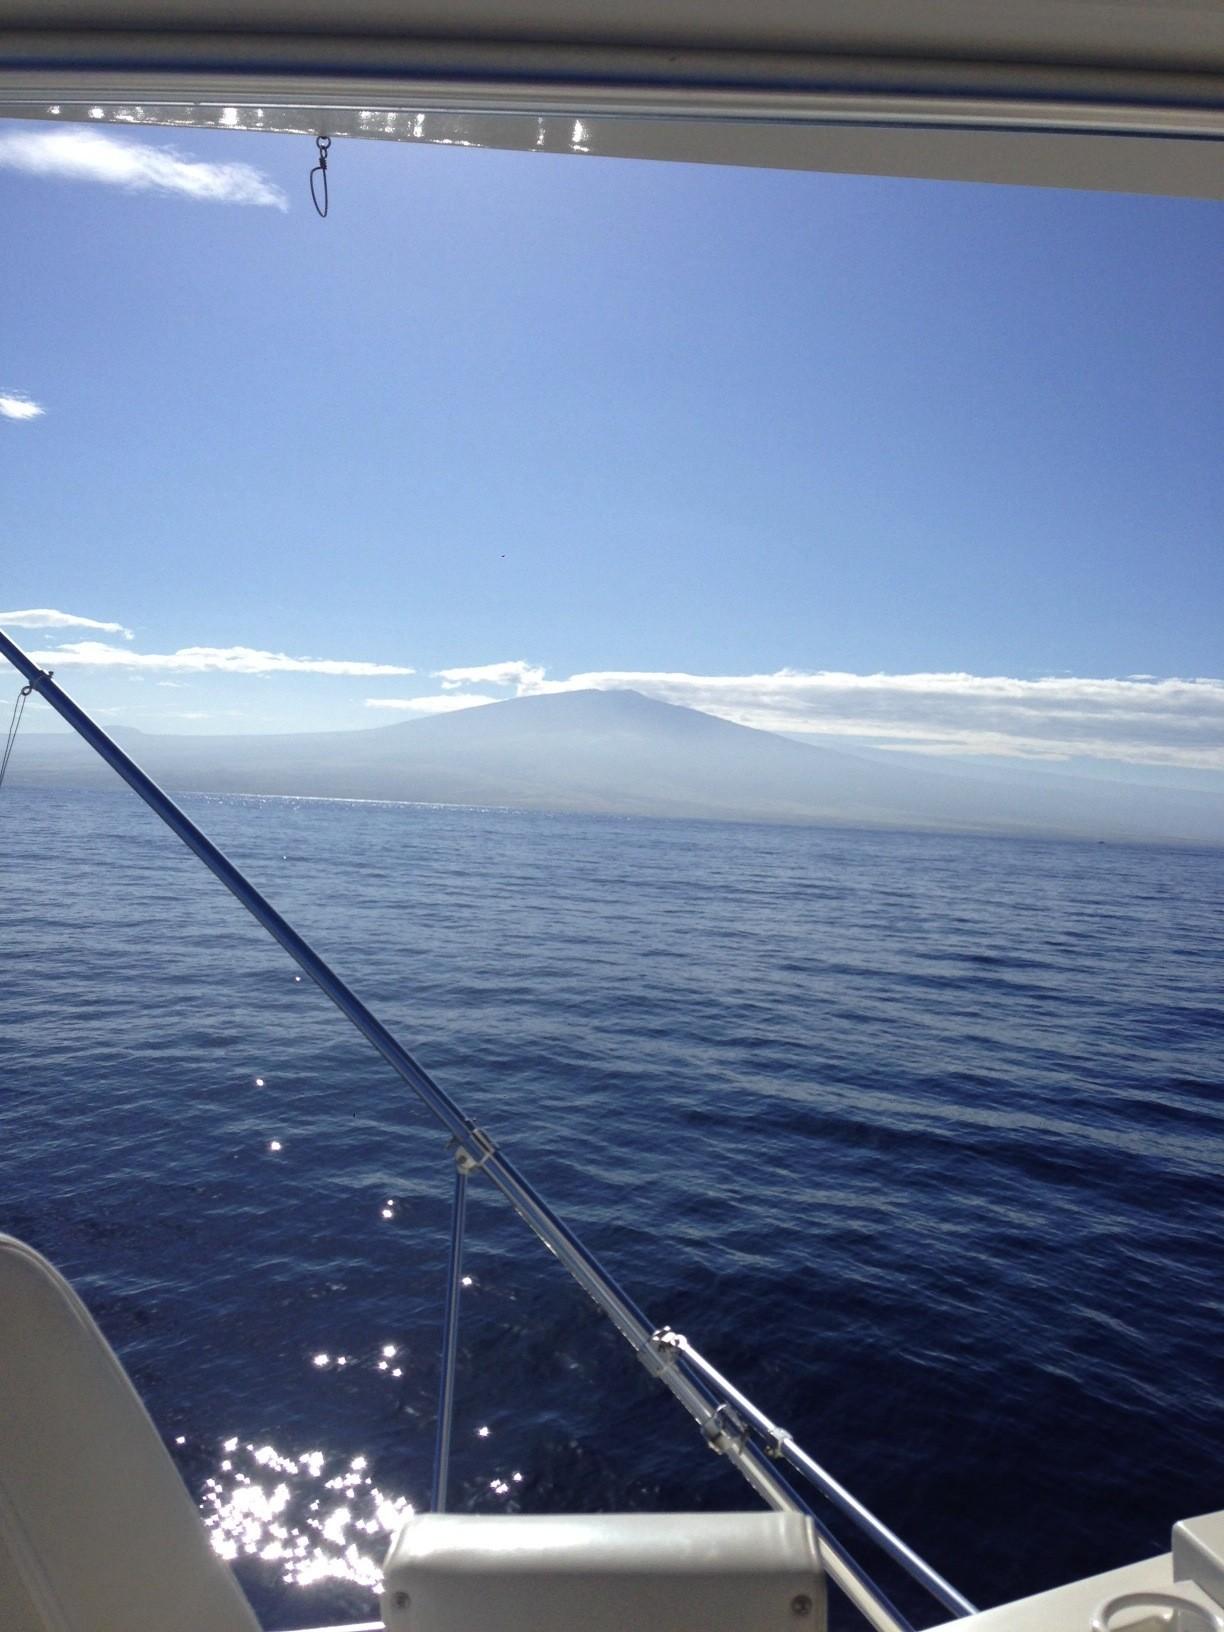 Foxy Lady Sportfishing: Full Day Charter